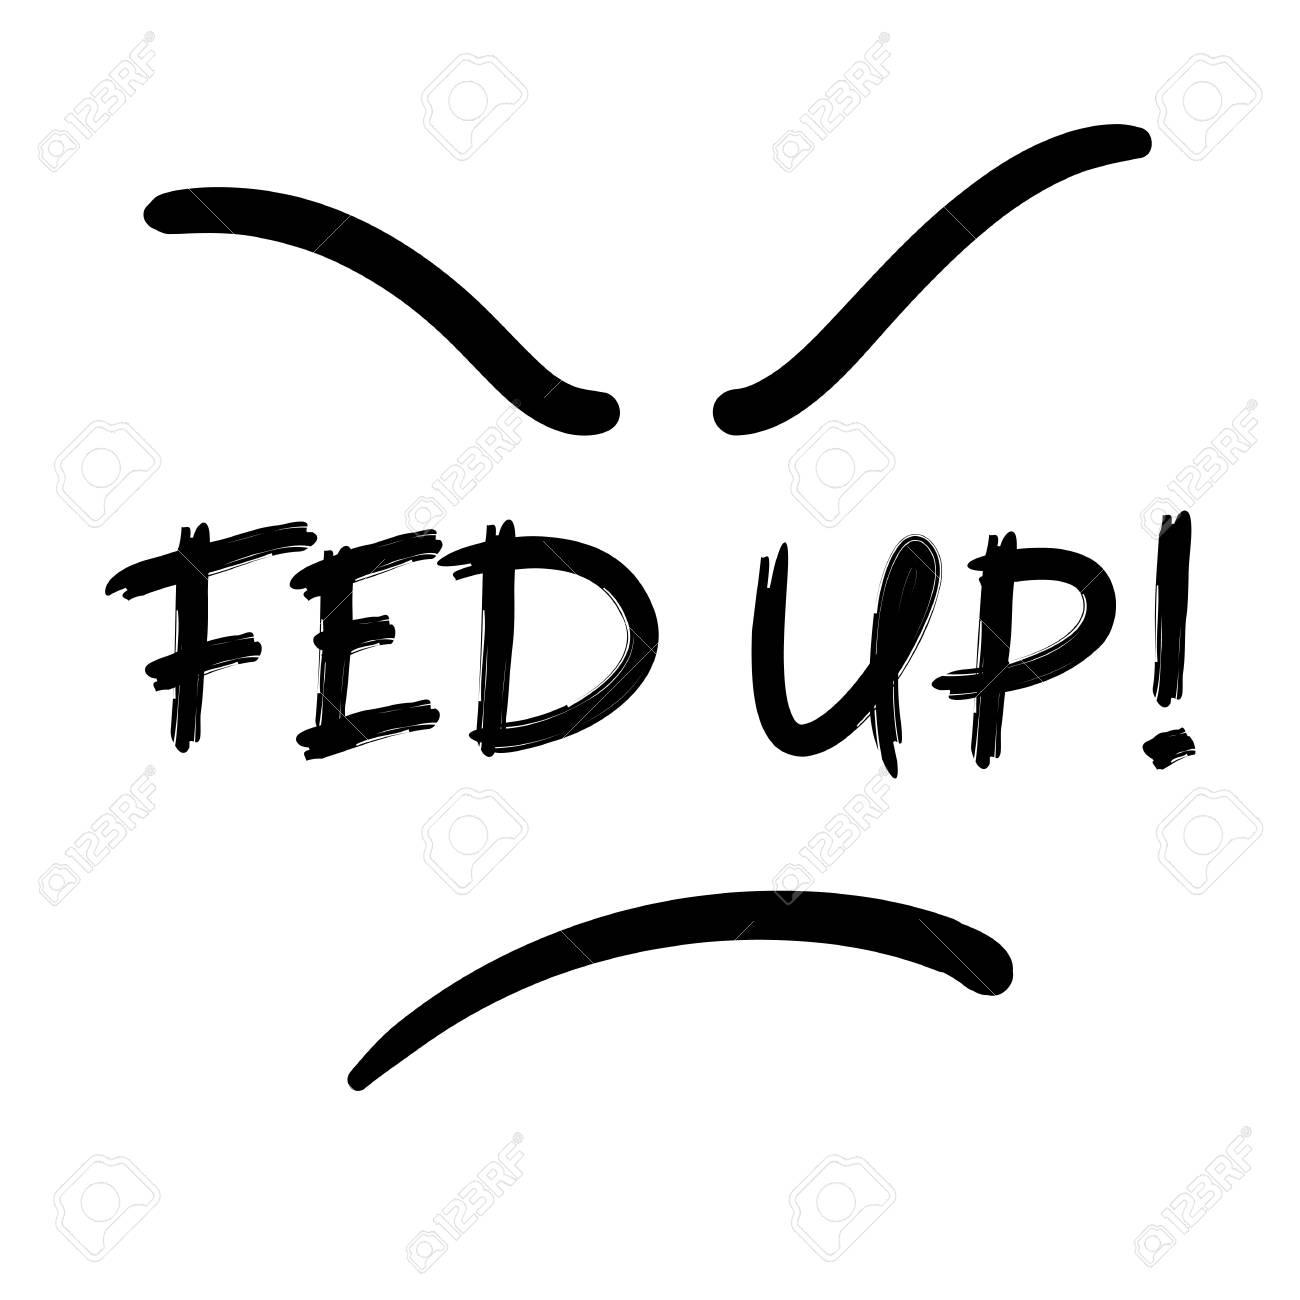 Fed up! - emotional handwritten quote, American slang, urban